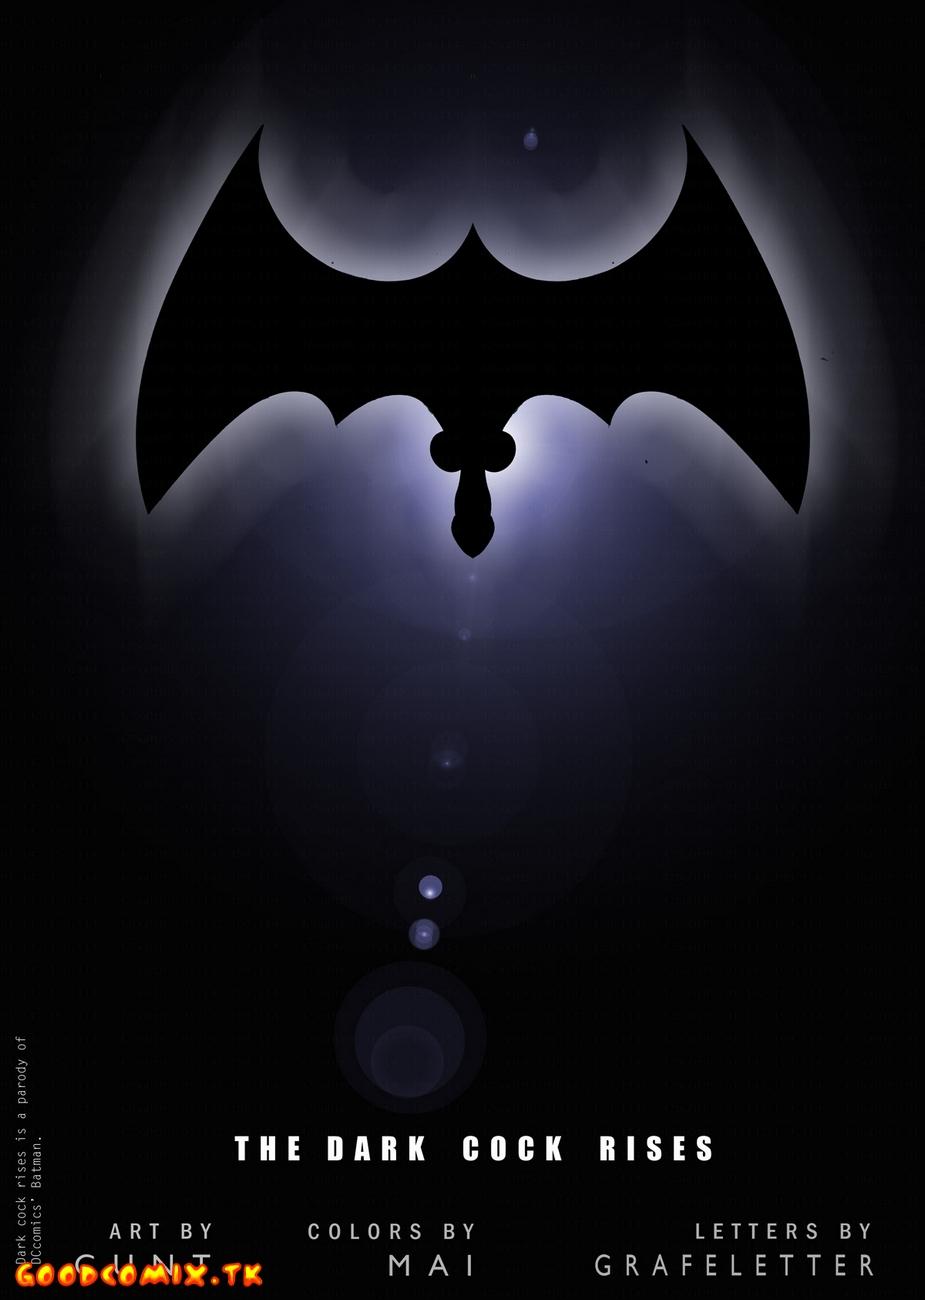 Goodcomix.tk Batman - [JKRcomix][Cunt] - The Dark Cock Rises